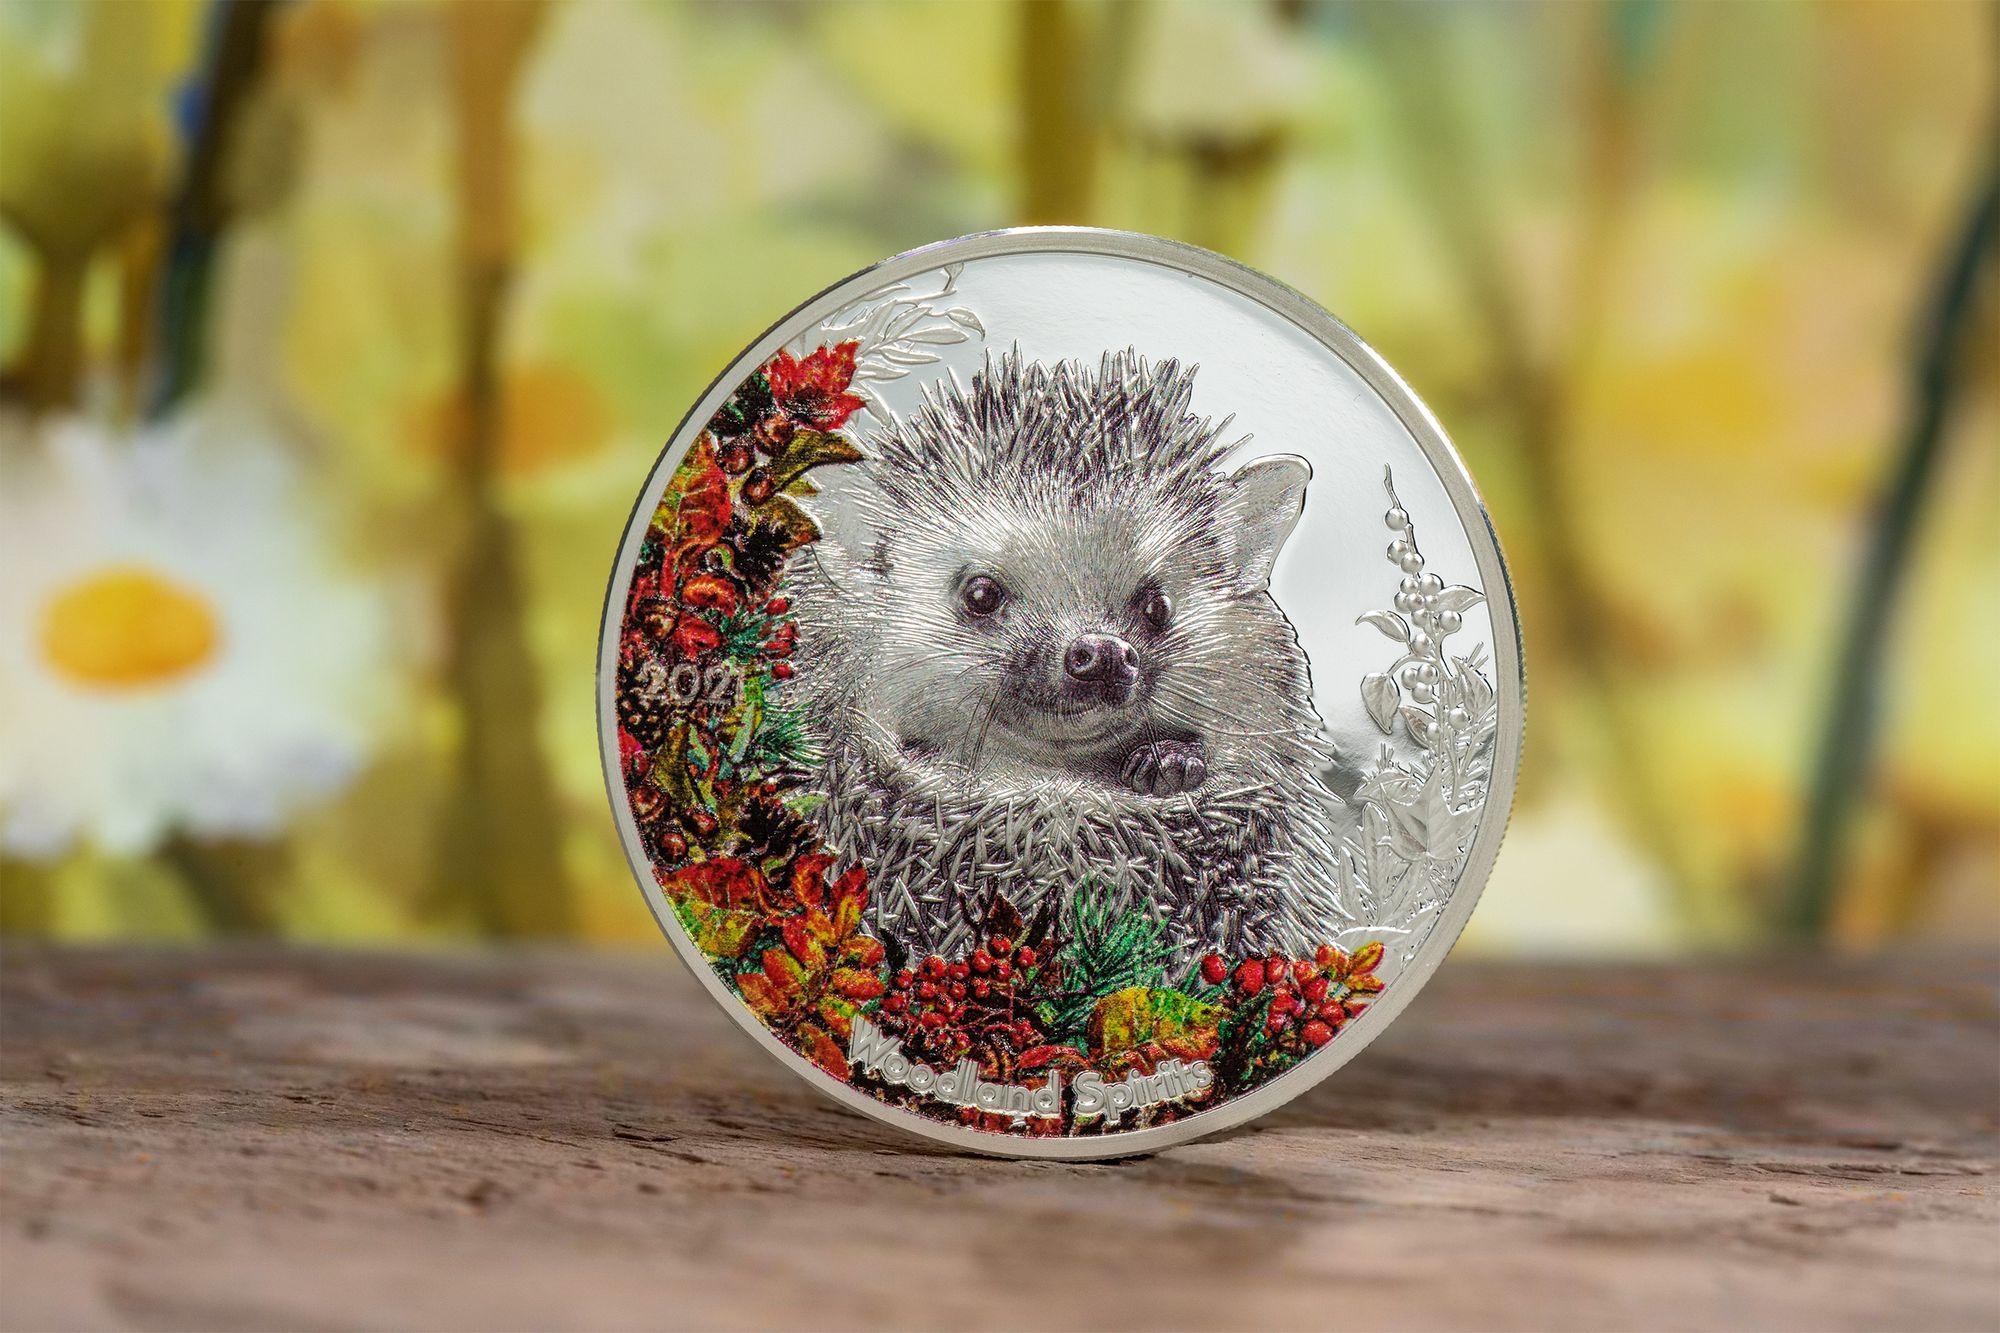 2021 Woodland Spirits Hedgehog 1oz Silver Coin